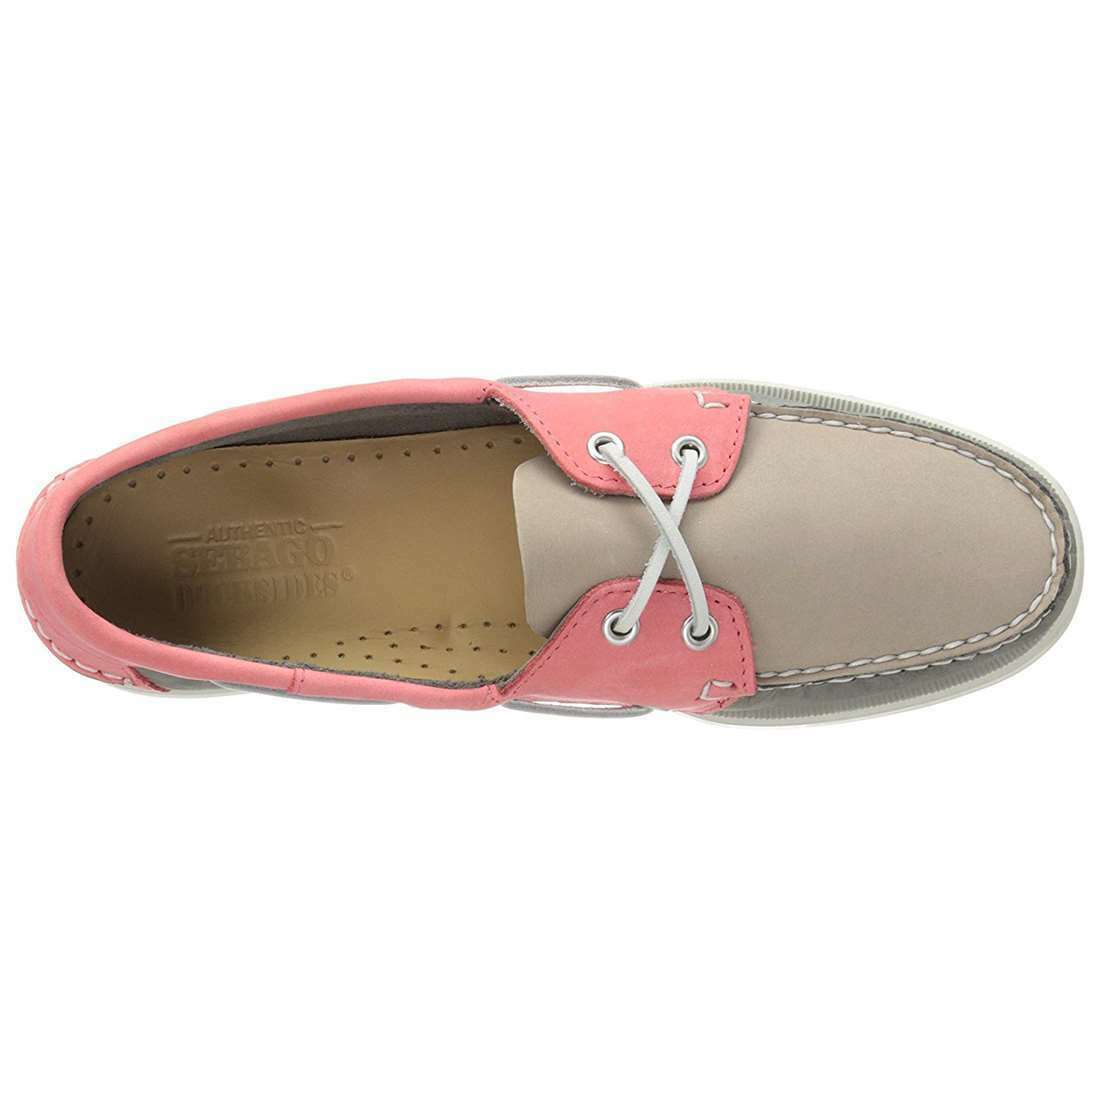 Sebago Docksides Women NEW NEW NEW Spinnaker 2-Eye Slip On Suede Boat shoes Loafers b1f665